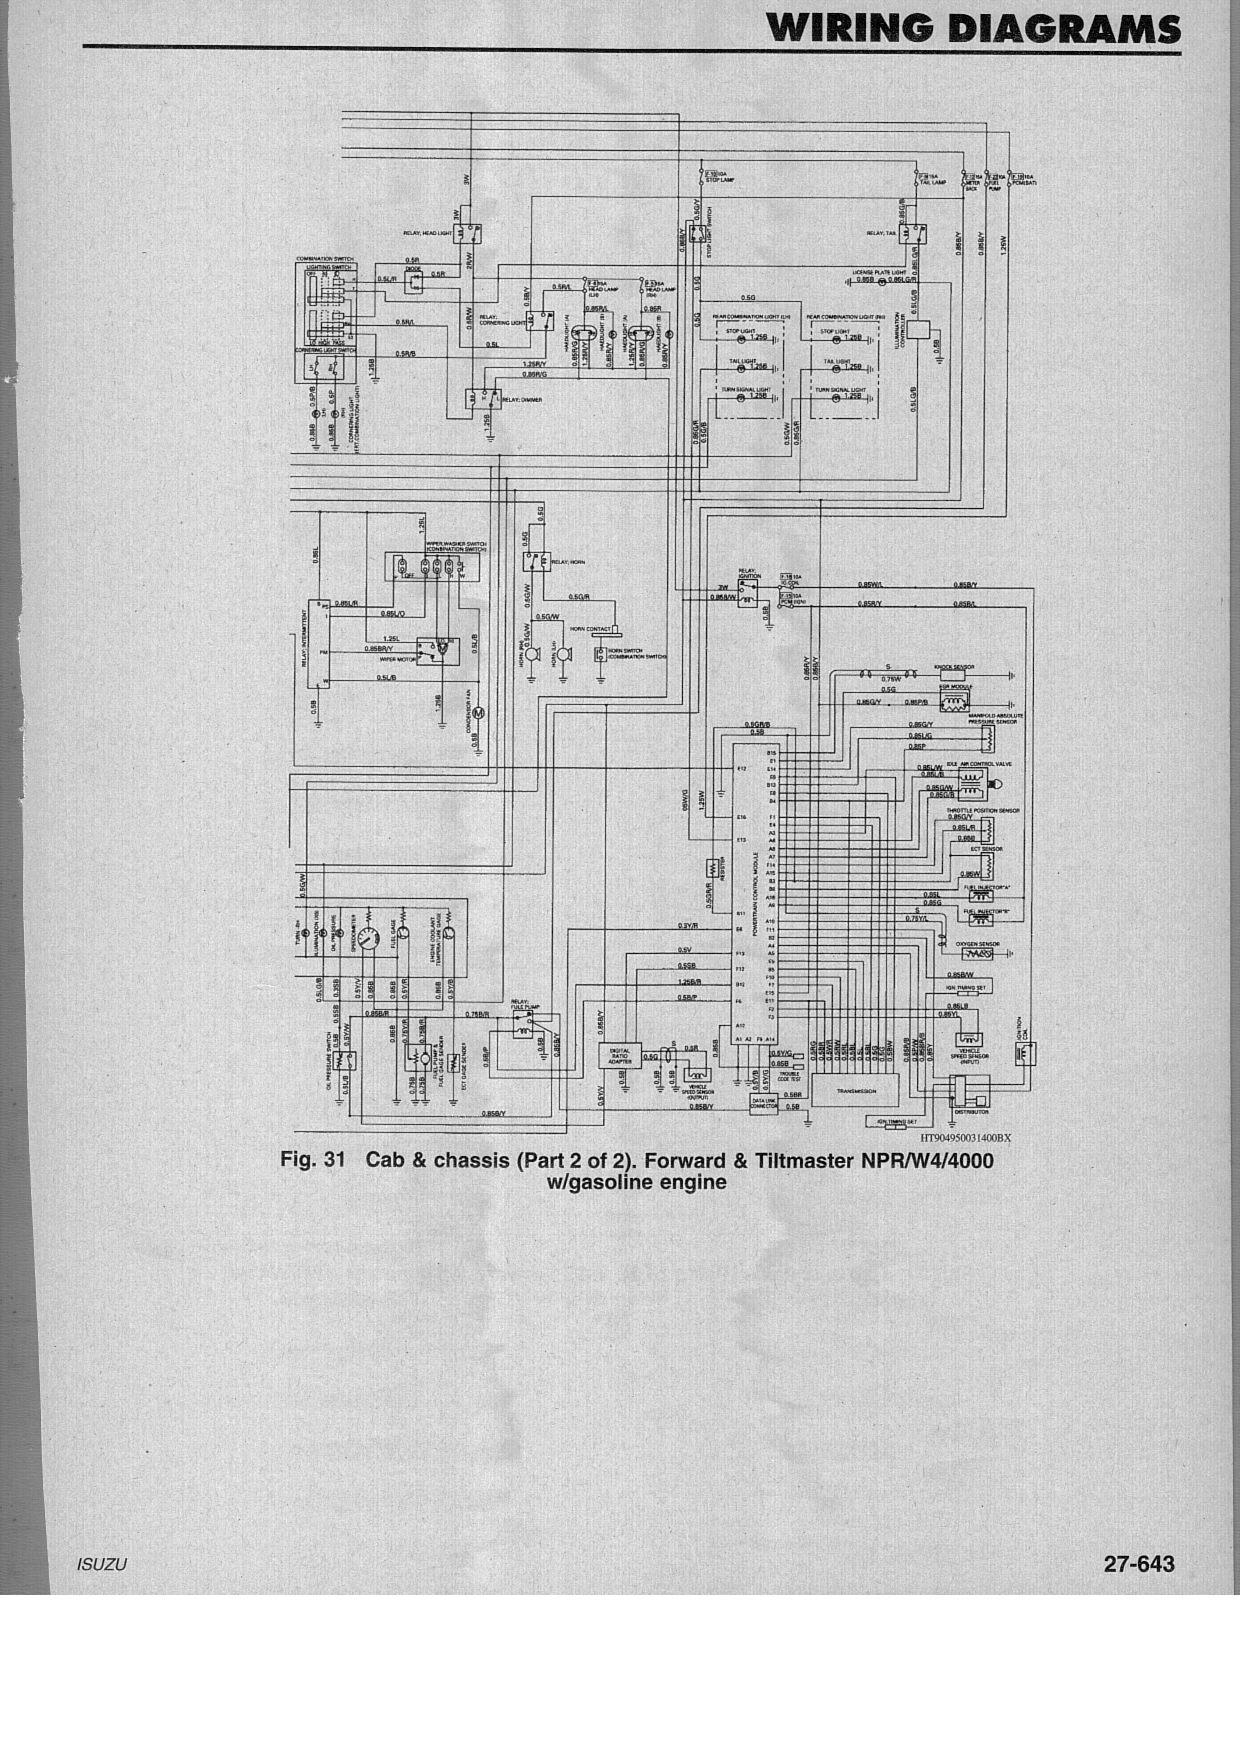 07 Chevy W4500 Throttle Wiring Diagram